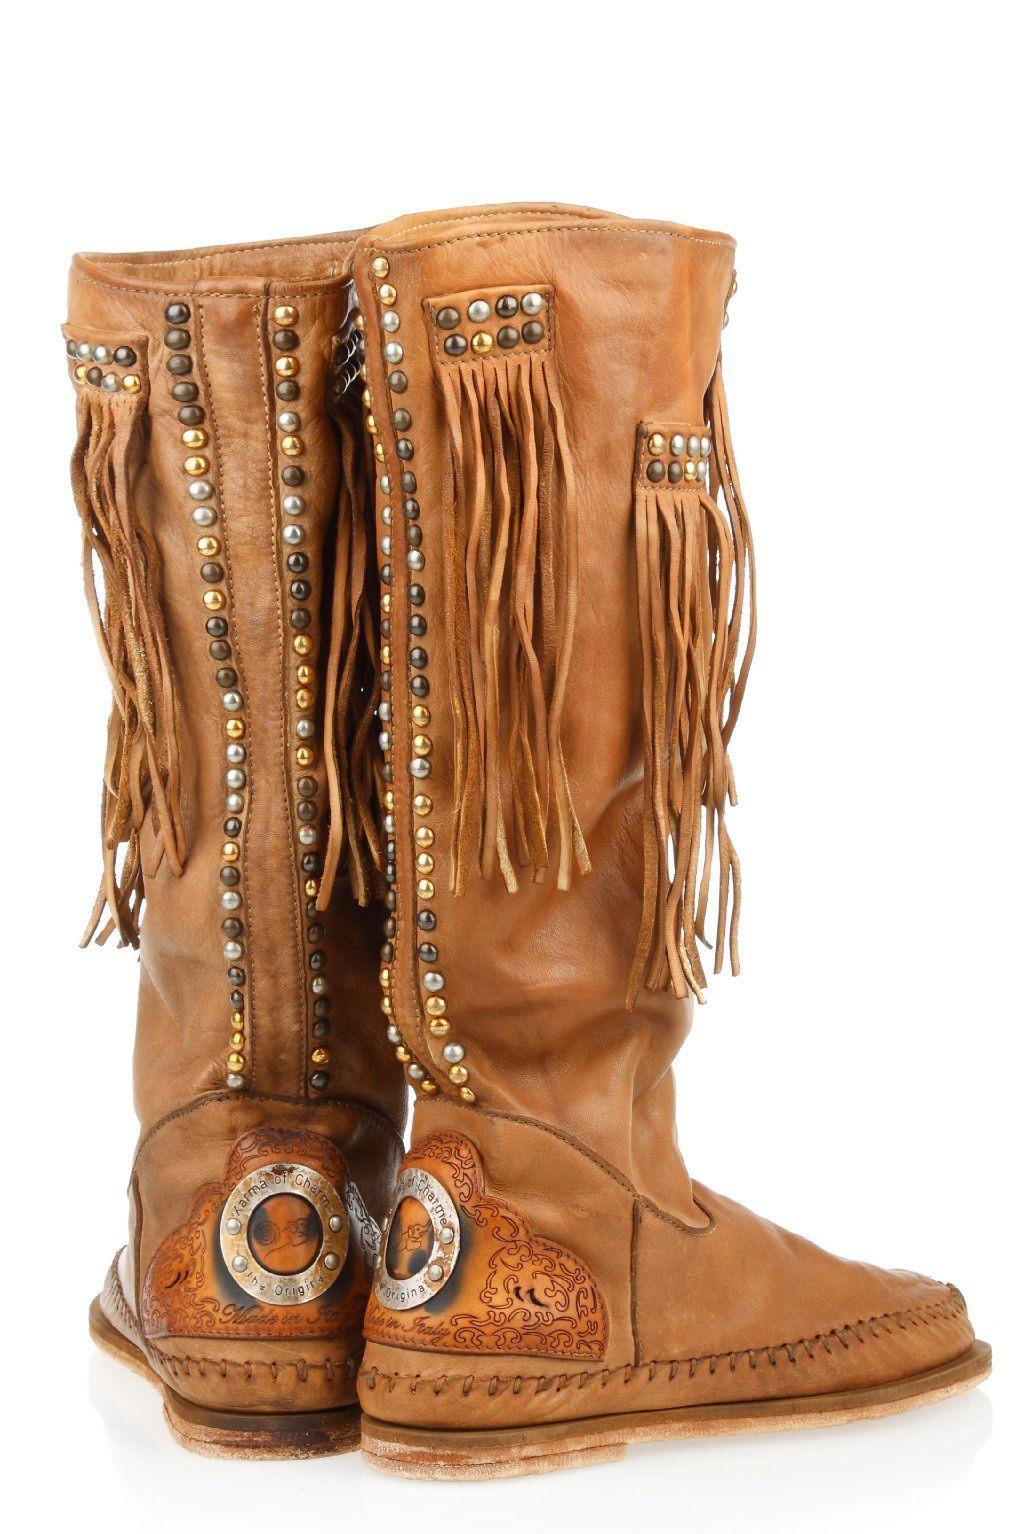 delicate kleuren sportschoenen gekke prijs Shopping For The Running Shoes For Women | ☘ Bohemian ...